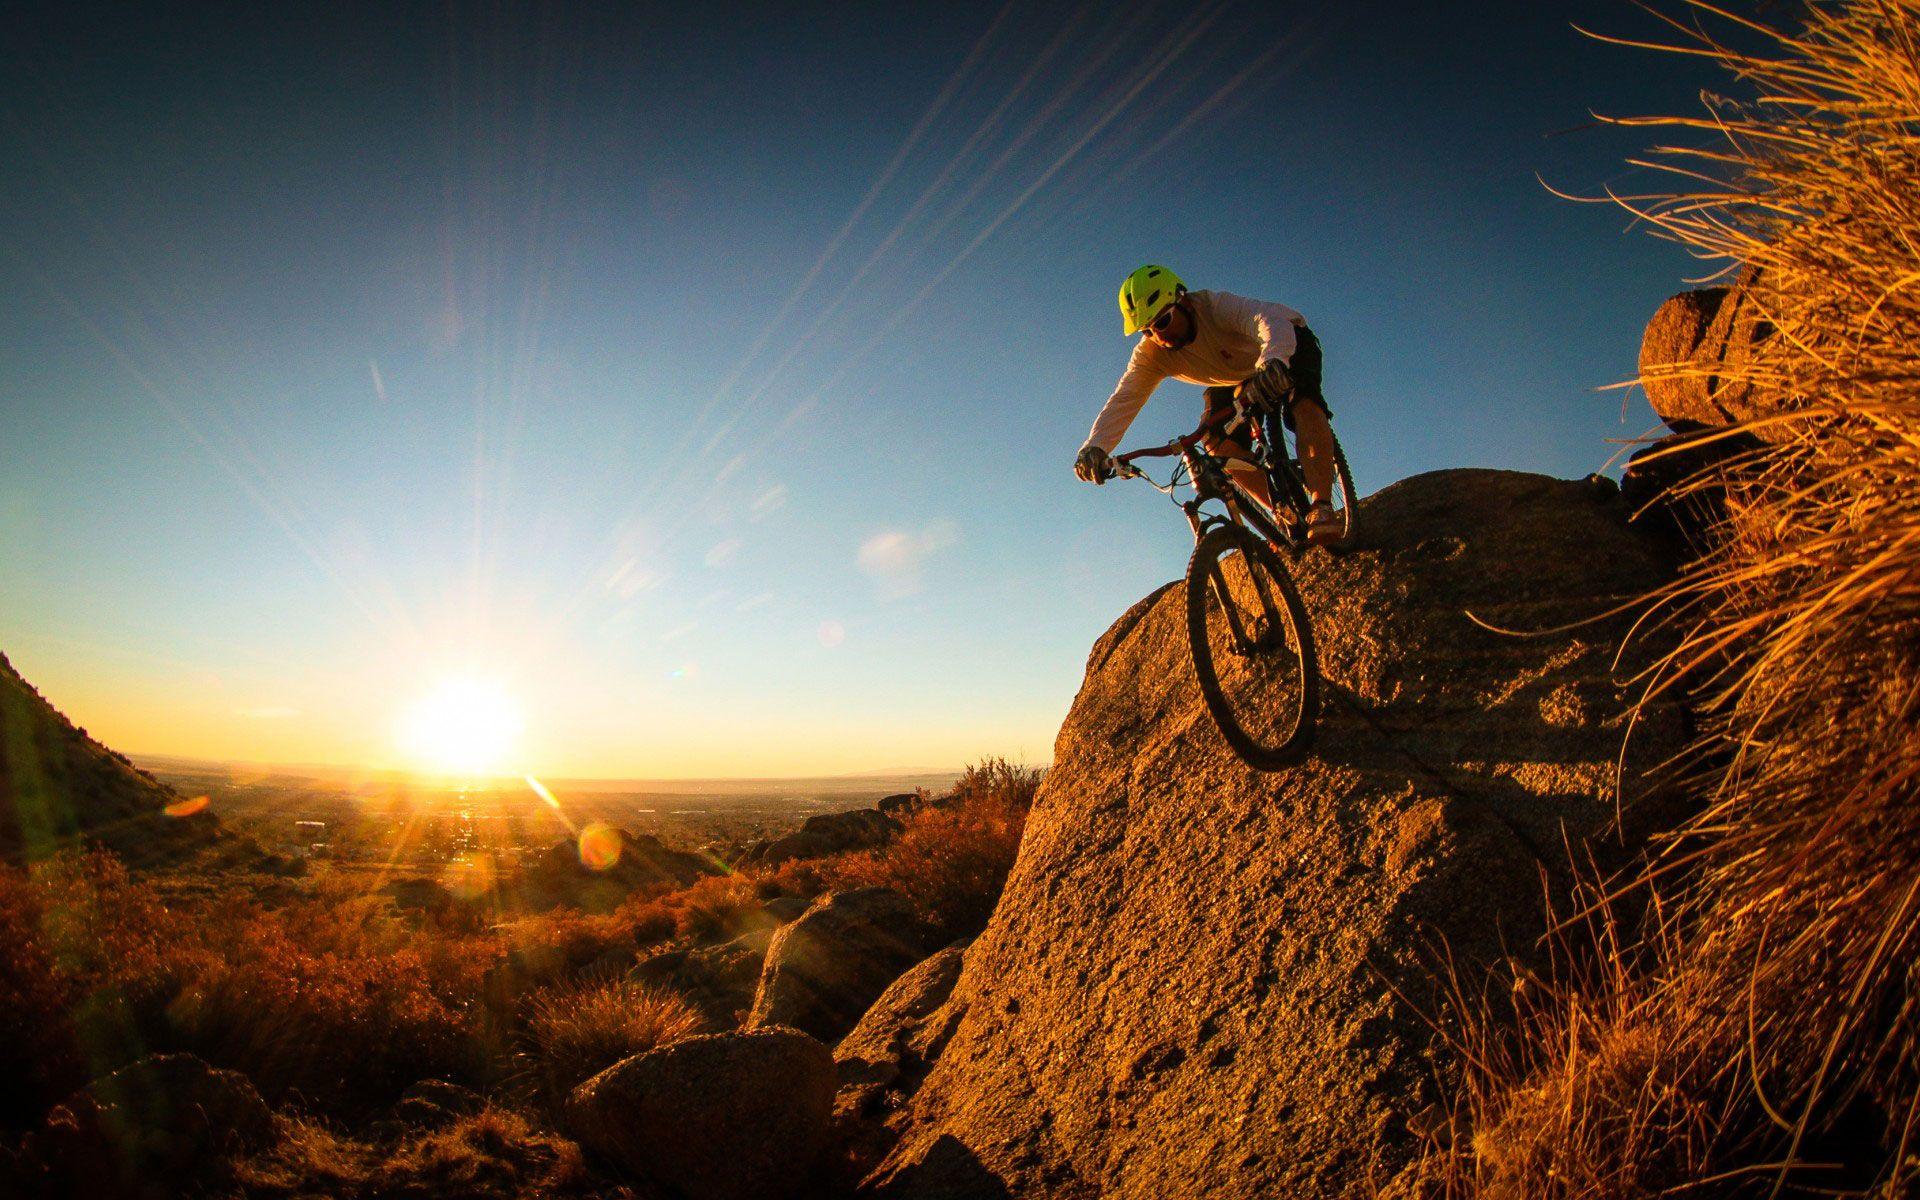 Another One Of My Favorite Hobbies Mountain Biking Bike Action Best Bikes